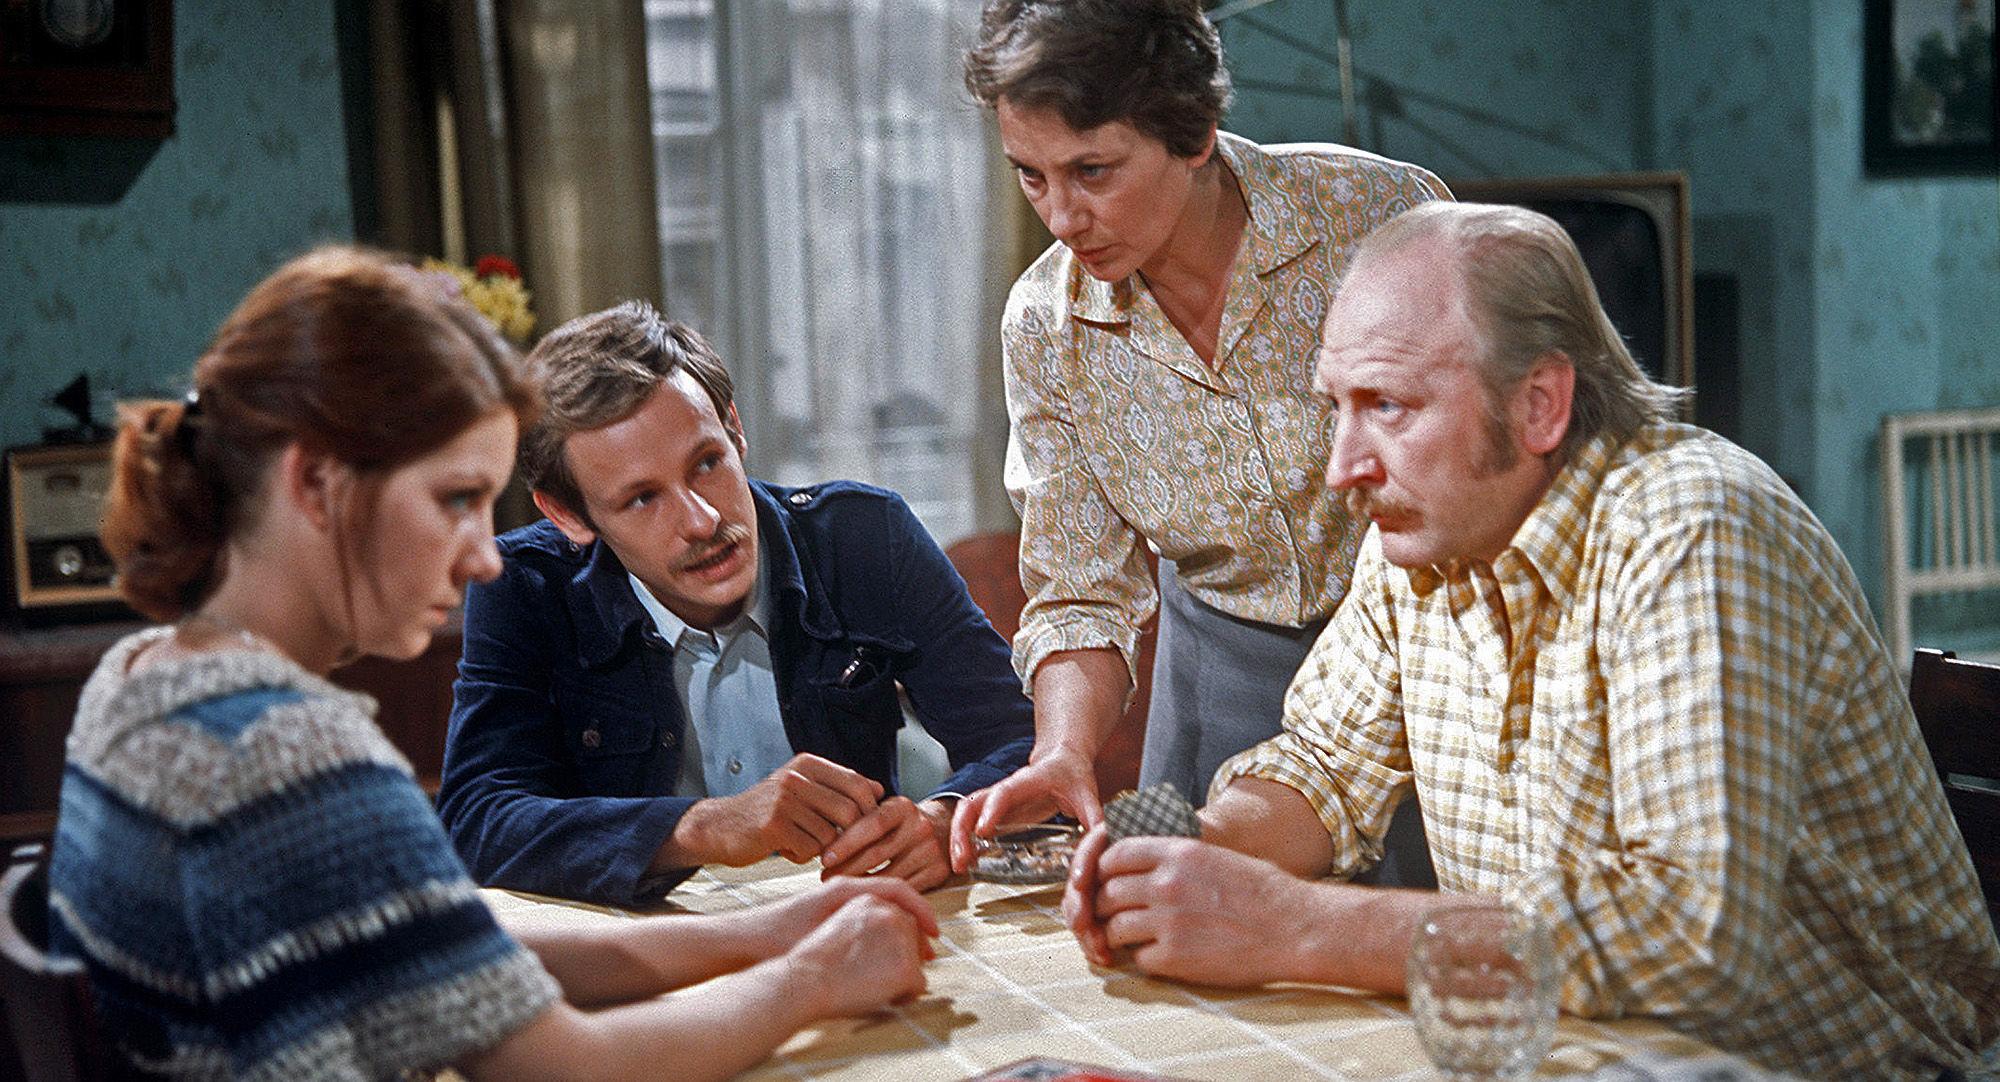 Hanni (Erika Deutinger), Franzi (Alexander Wächter), Toni (Ingrid Burkhard), Mundl (Karl Merkatz)